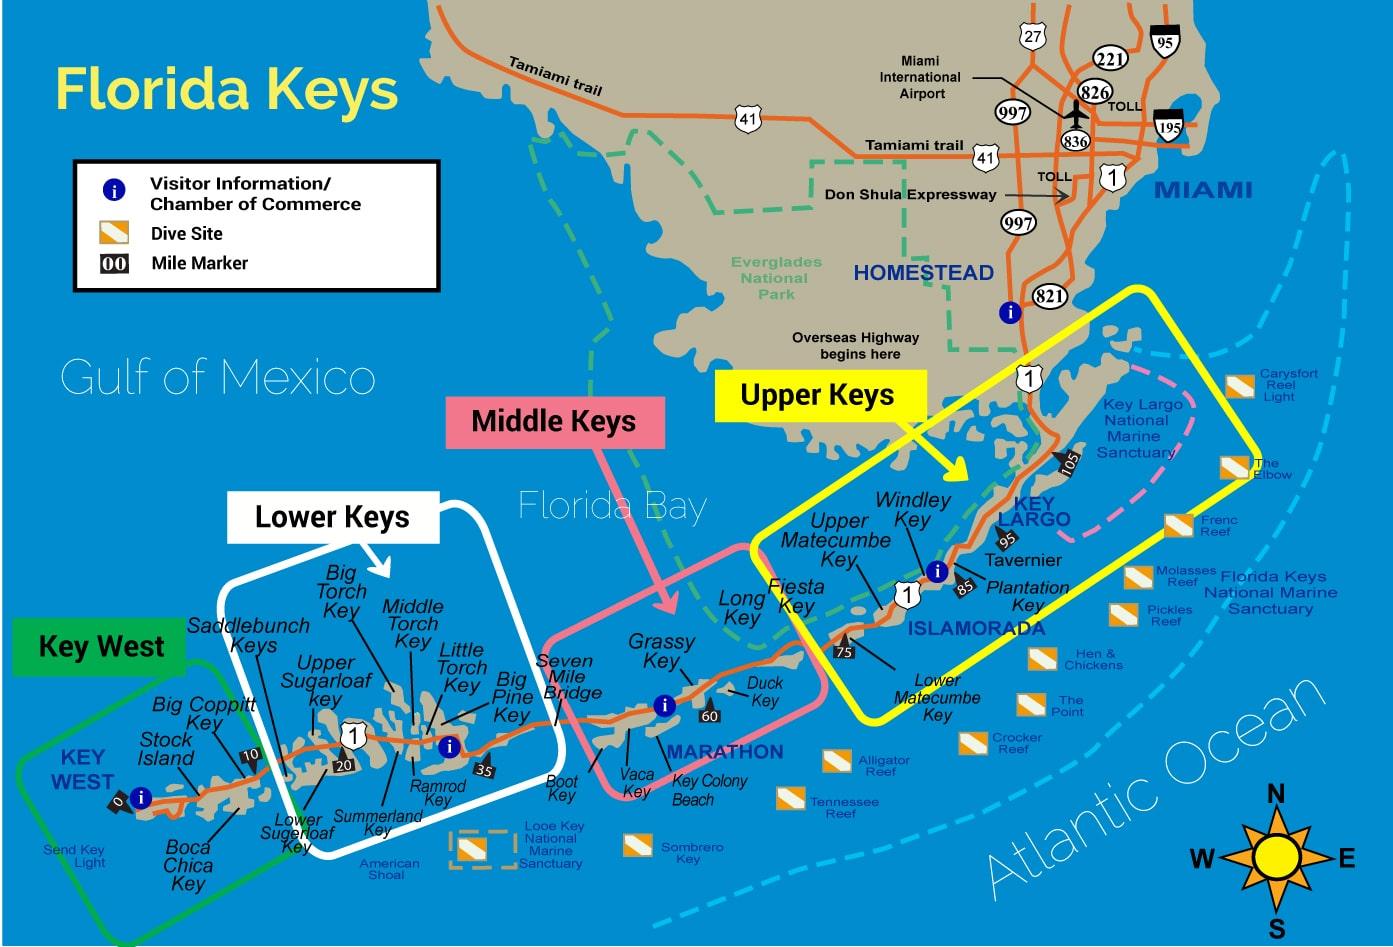 Florida Keys Islands Facts